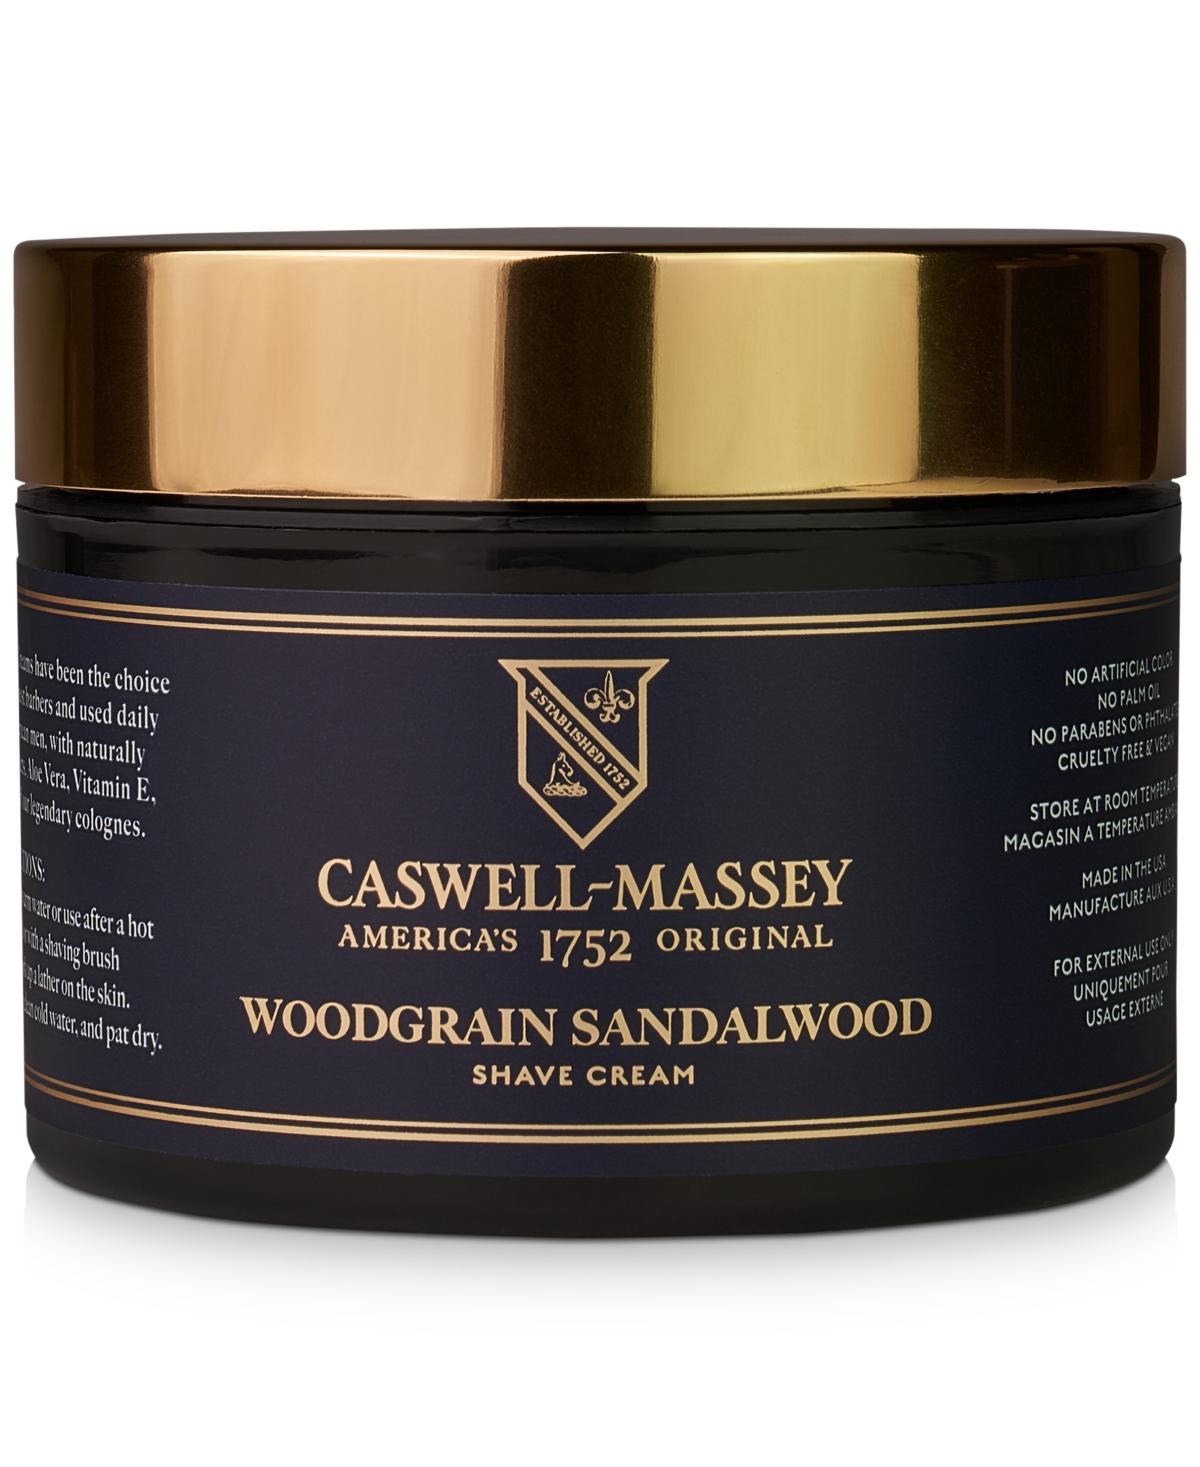 Caswell Massey Heritage Woodgrain Sandalwood Shave Cream, 8-oz.